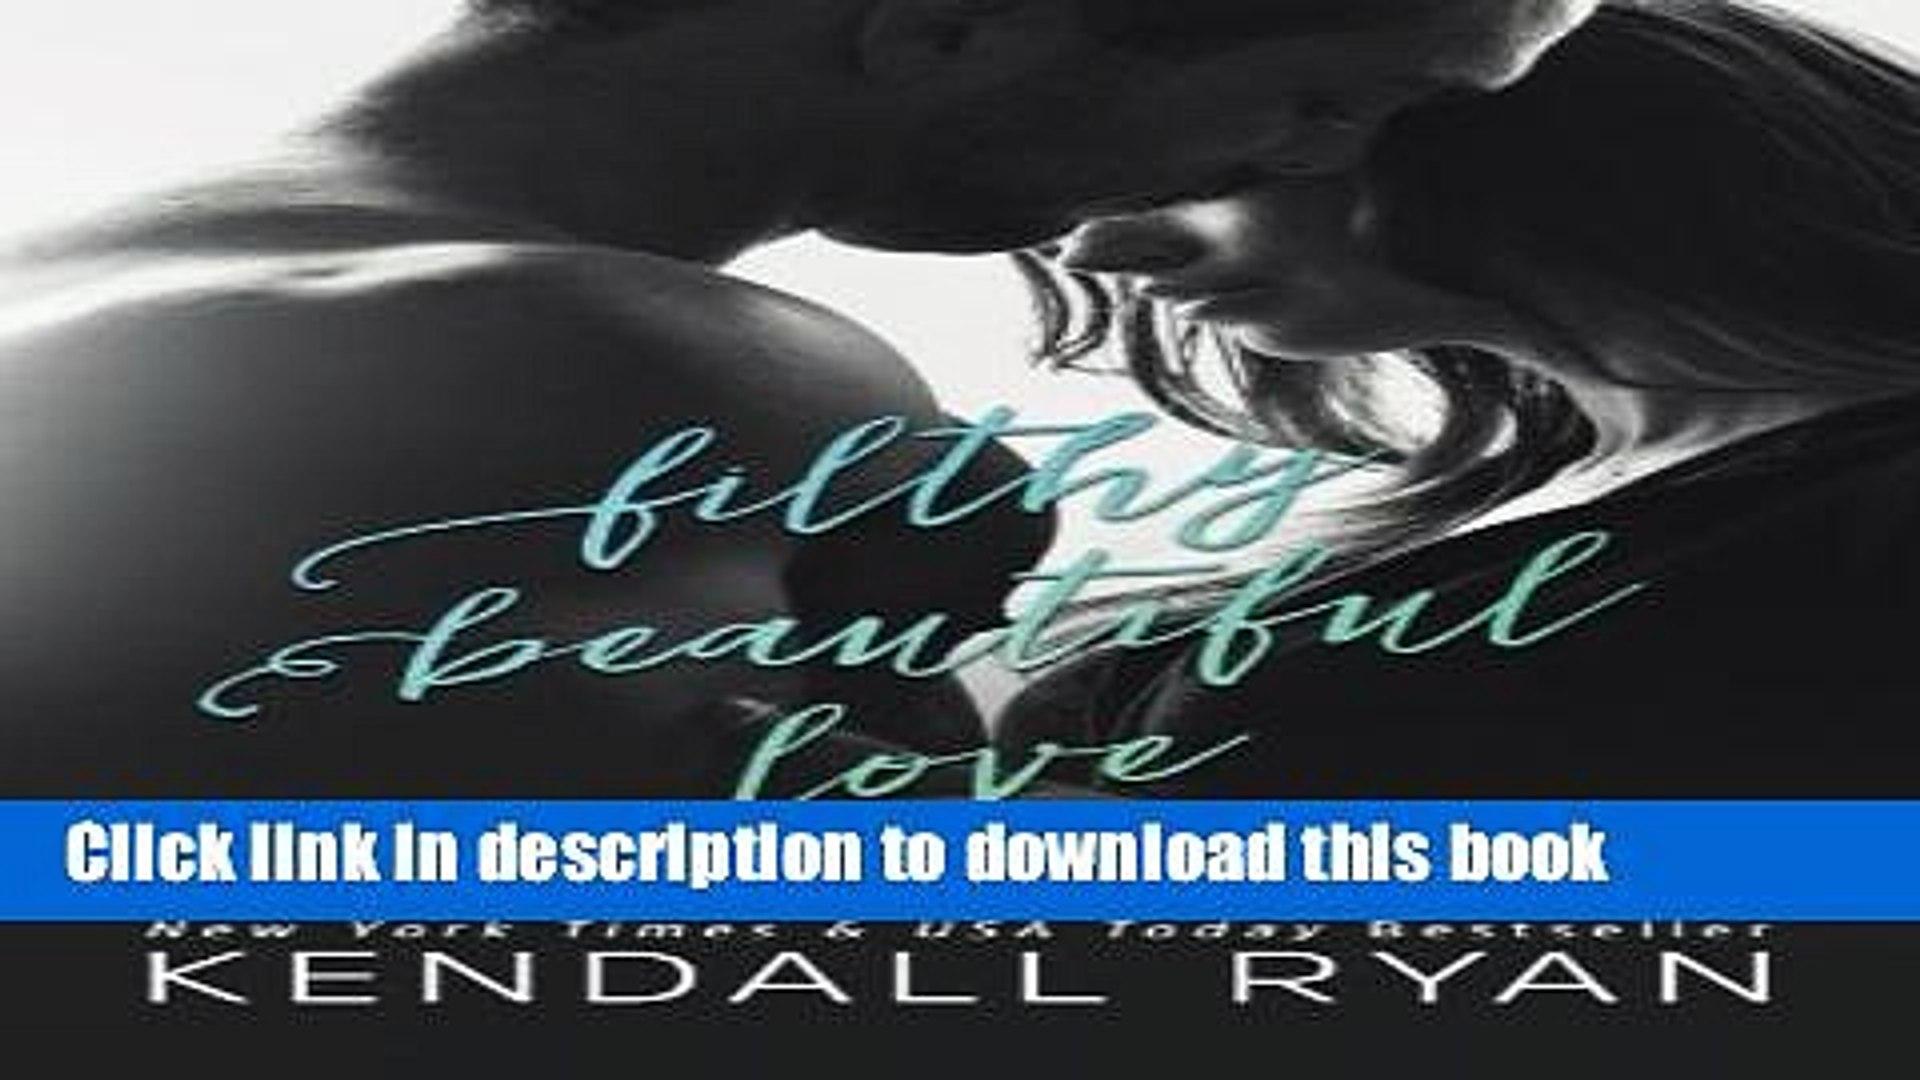 Read Filthy Beautiful Love (Filthy Beautiful Lies Book 2) (Volume 2)  PDF Online